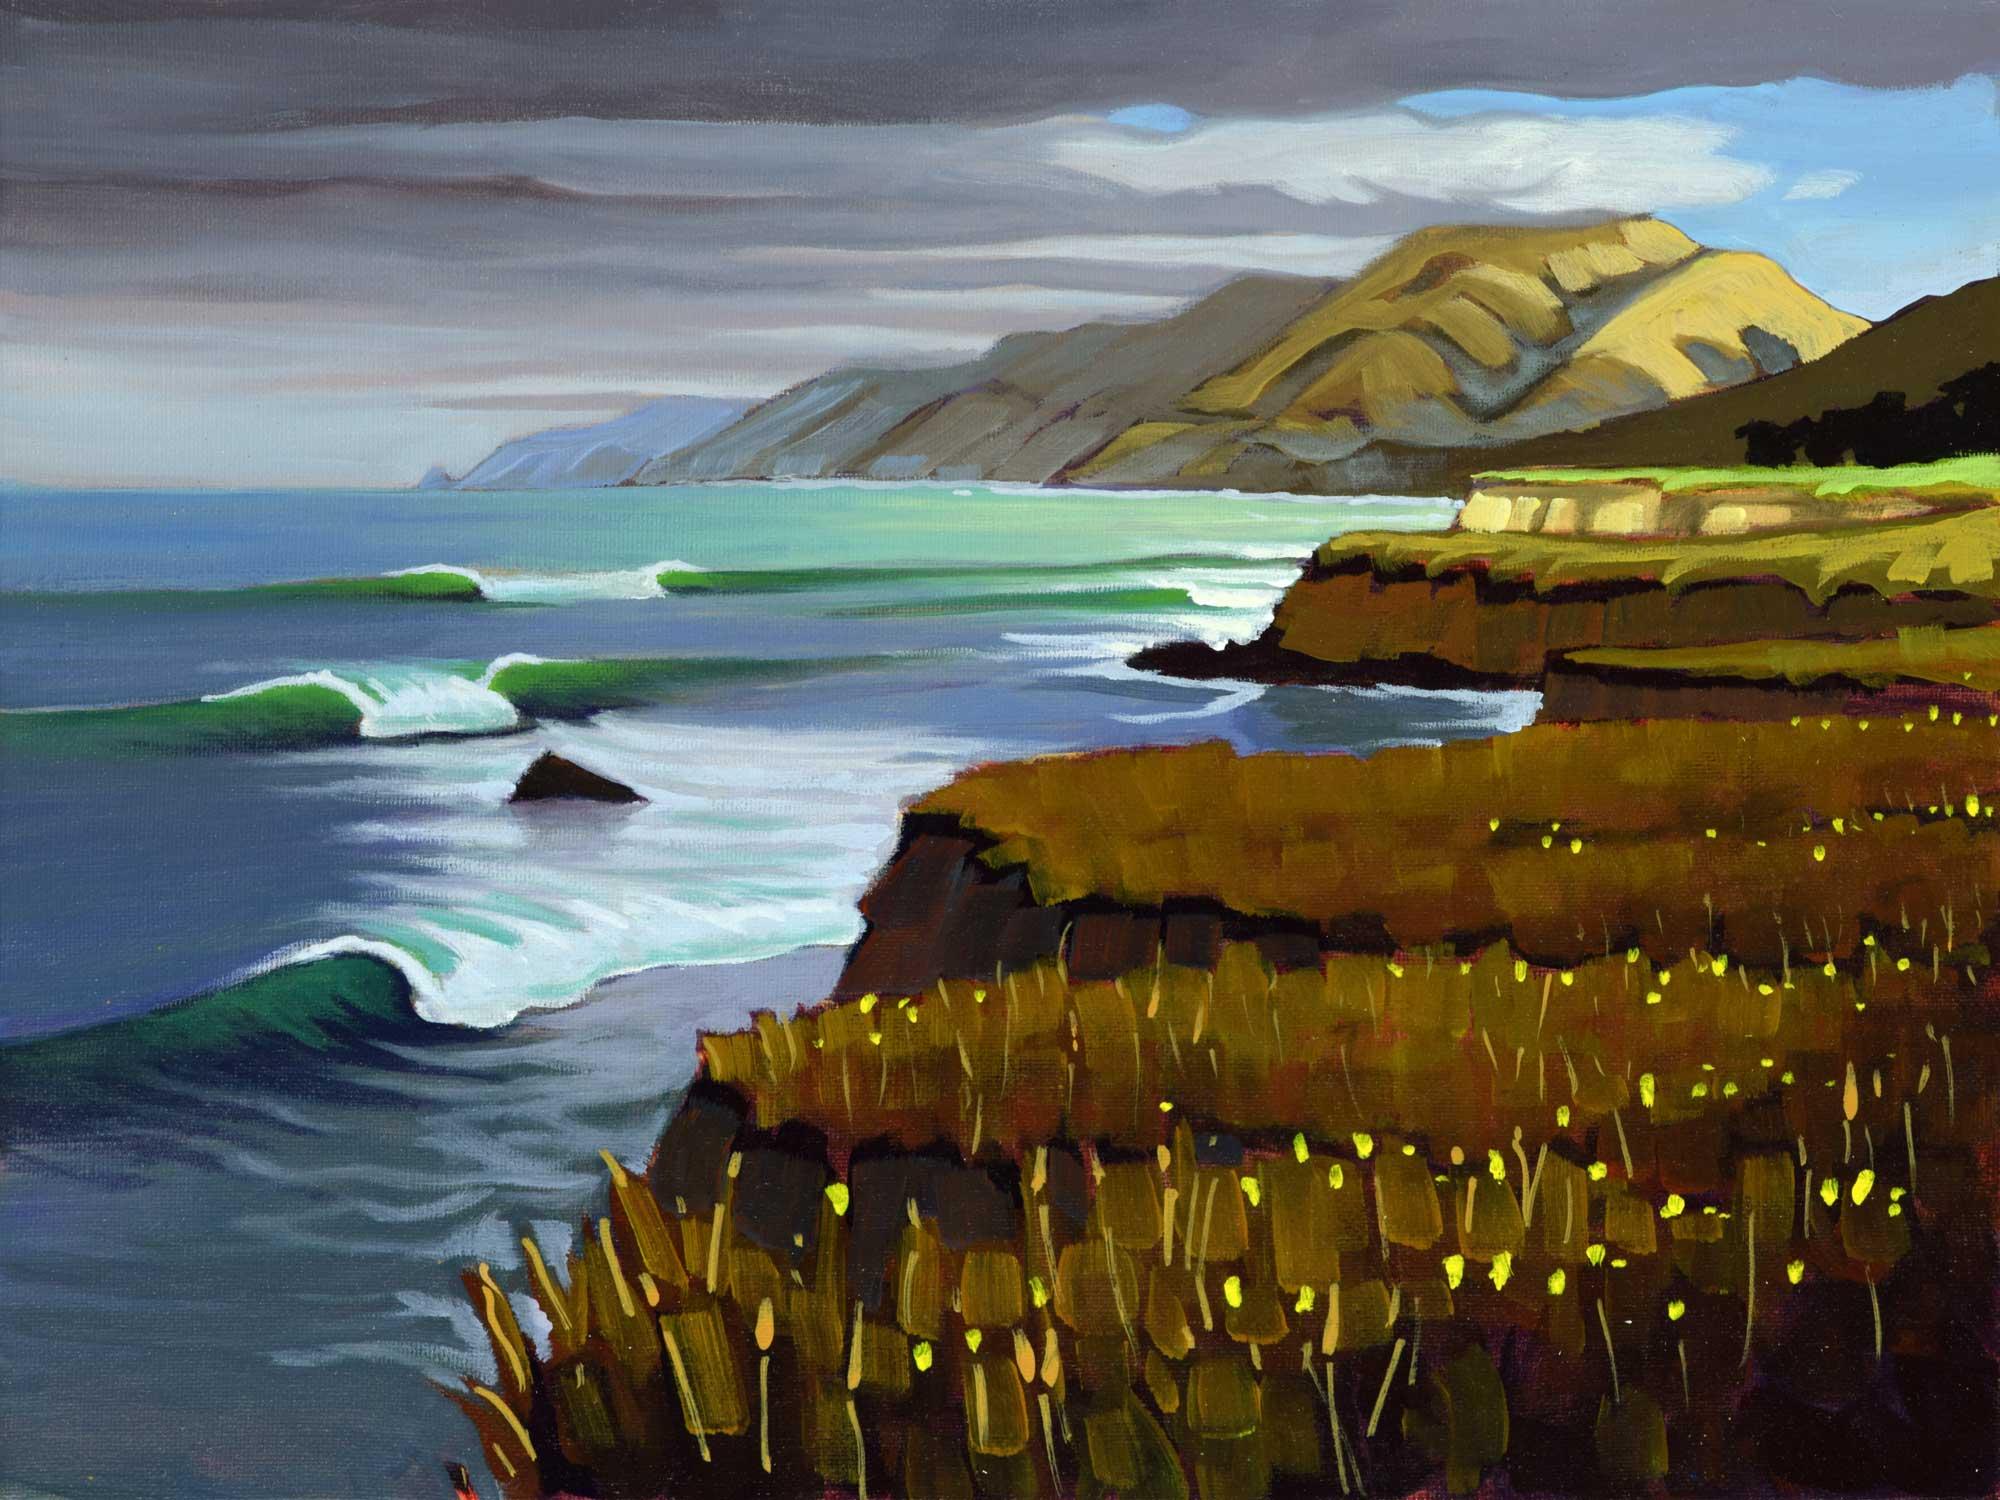 Plein air artwork from the San Luis Obispo county coast near Ragged Point in central California